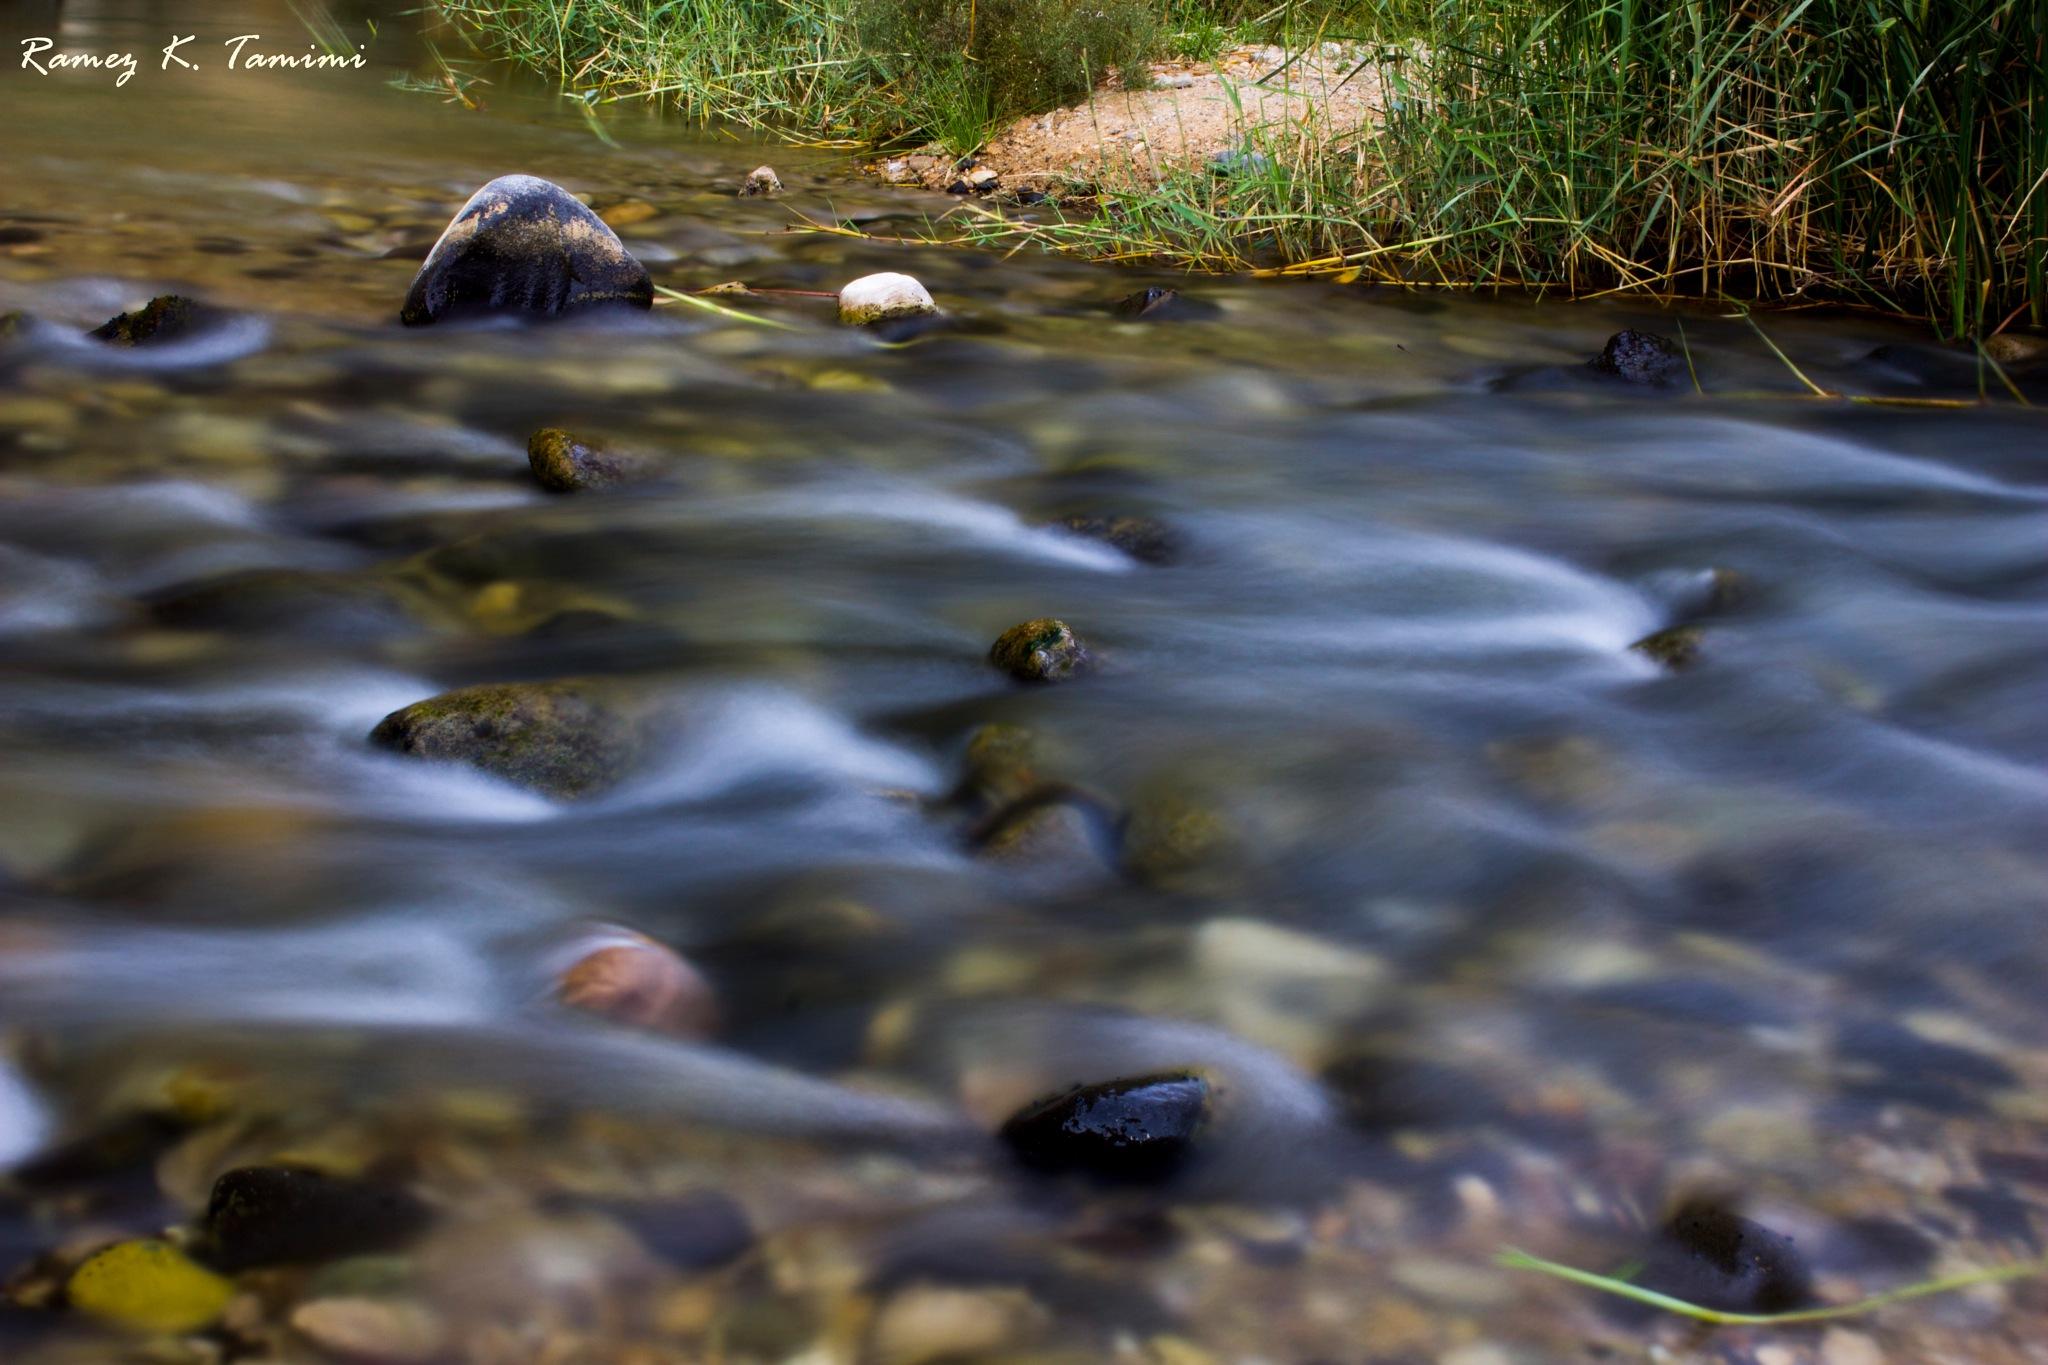 wadi al mujeb river by Ramez k. Tamimi